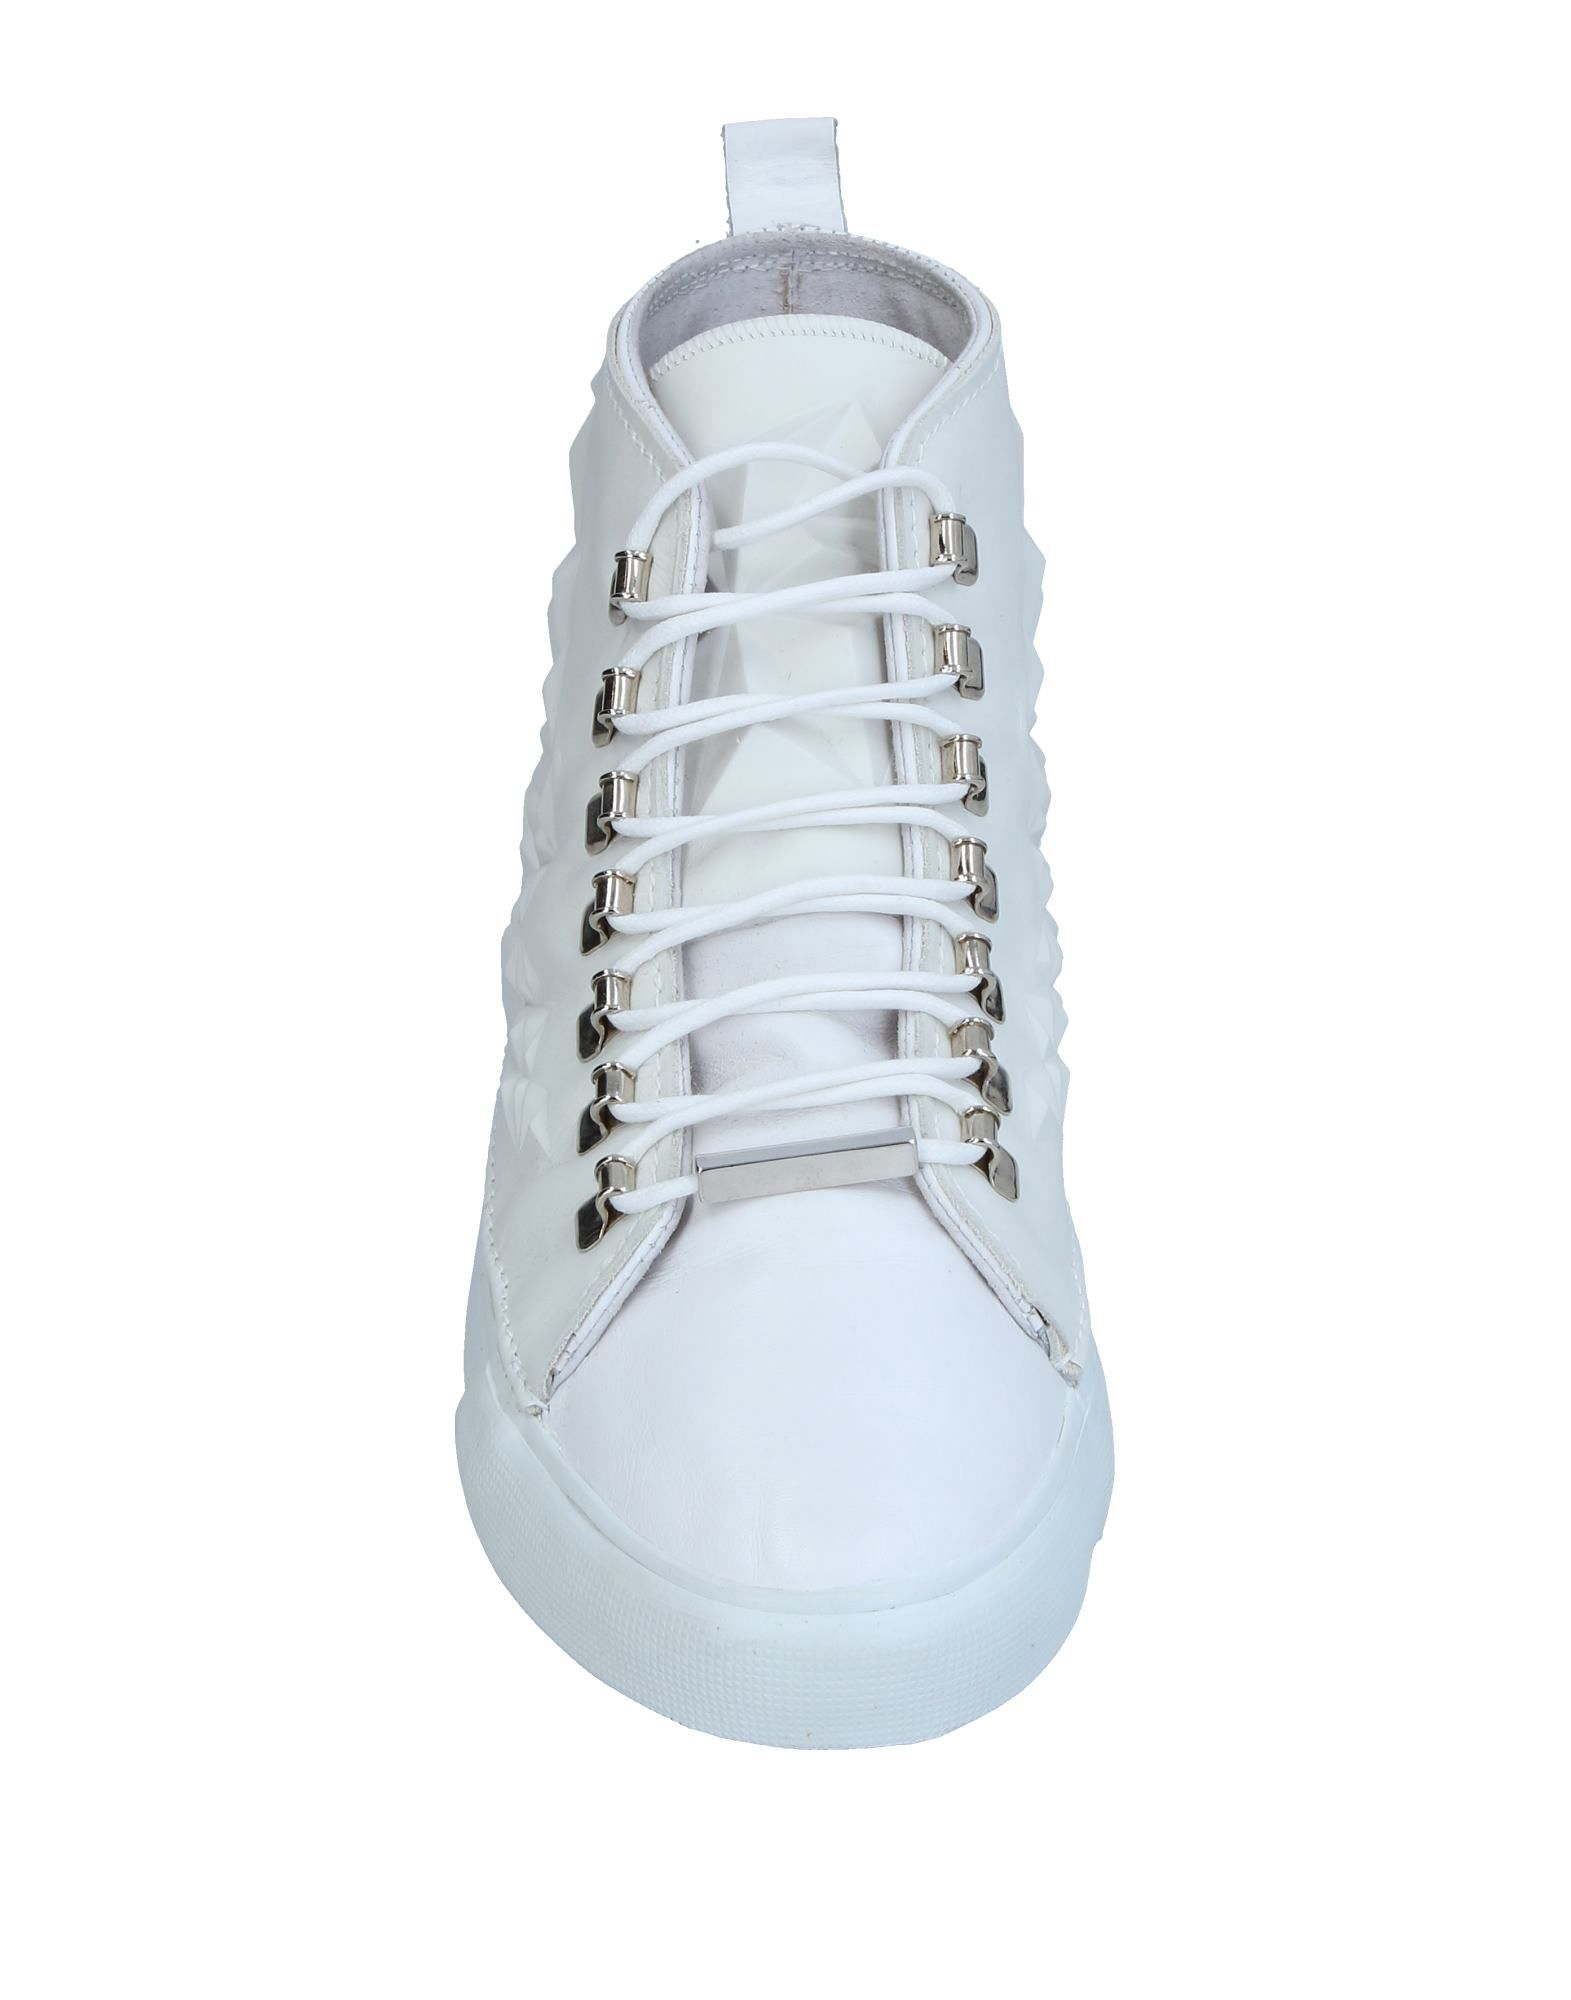 Sneakers Black Dioniso Femme - Sneakers Black Dioniso sur